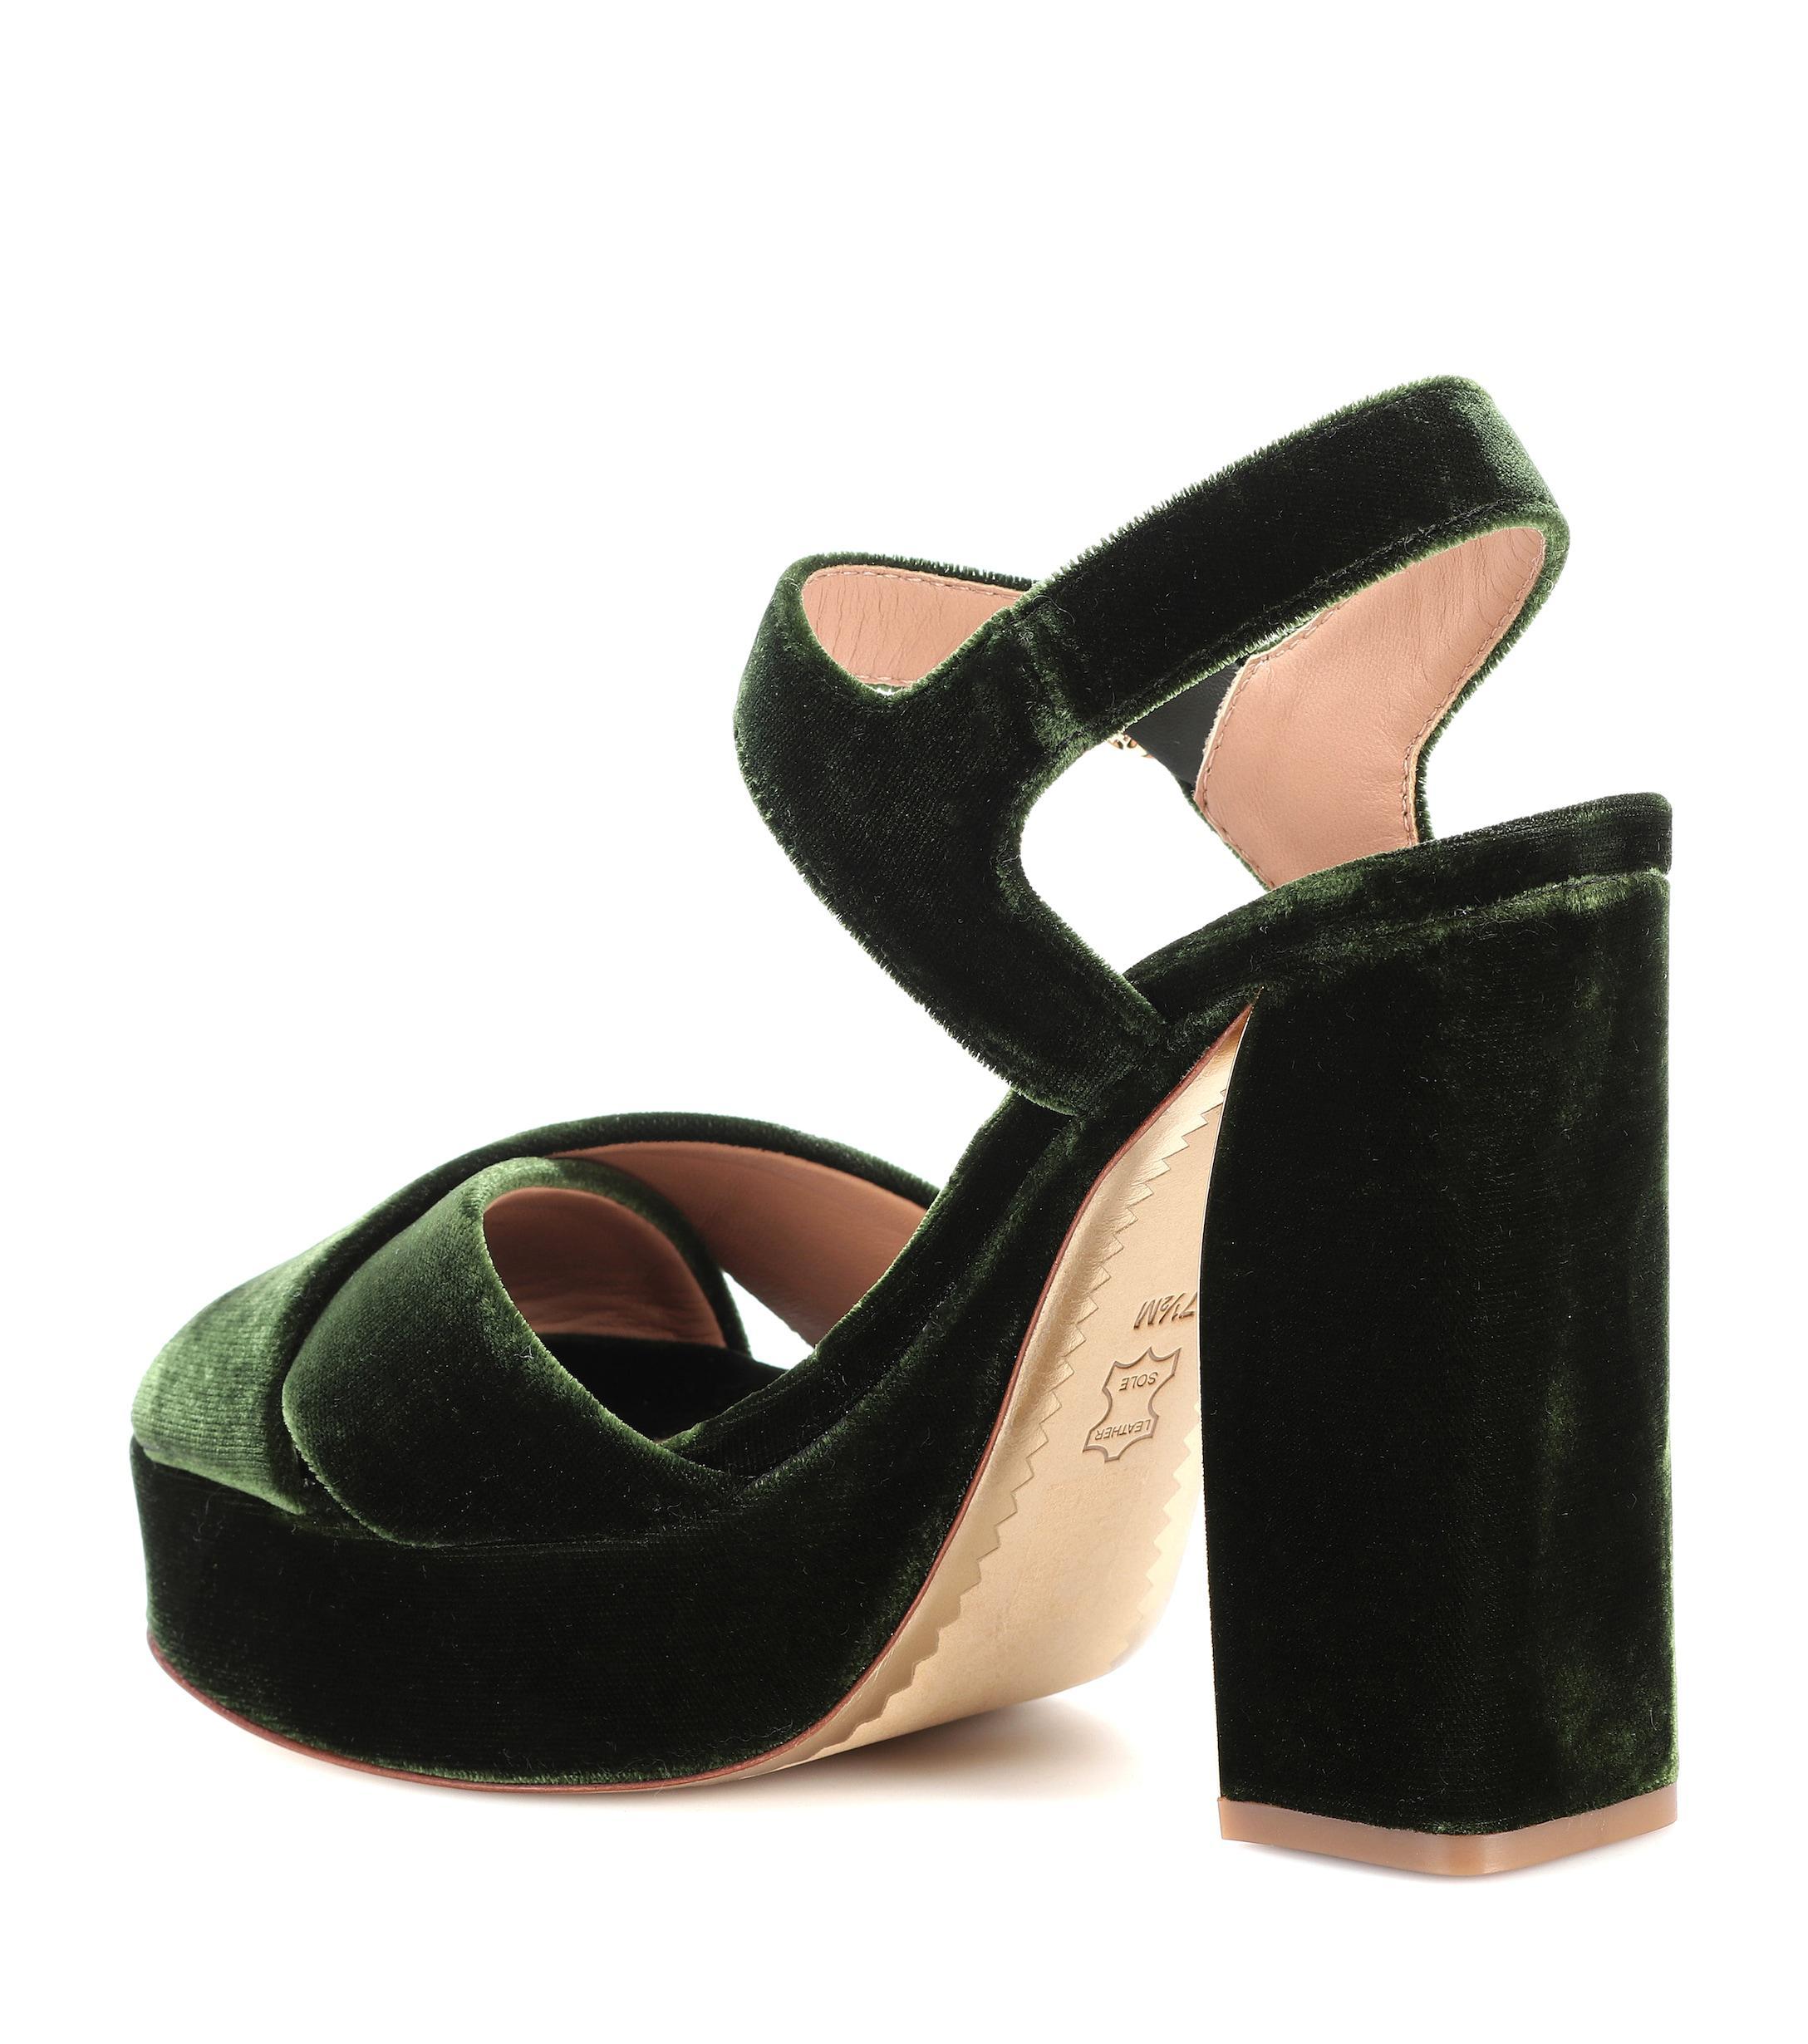 6bb30c143a7a Tory Burch - Black Loretta 115 Velvet Plateau Sandals - Lyst. View  fullscreen